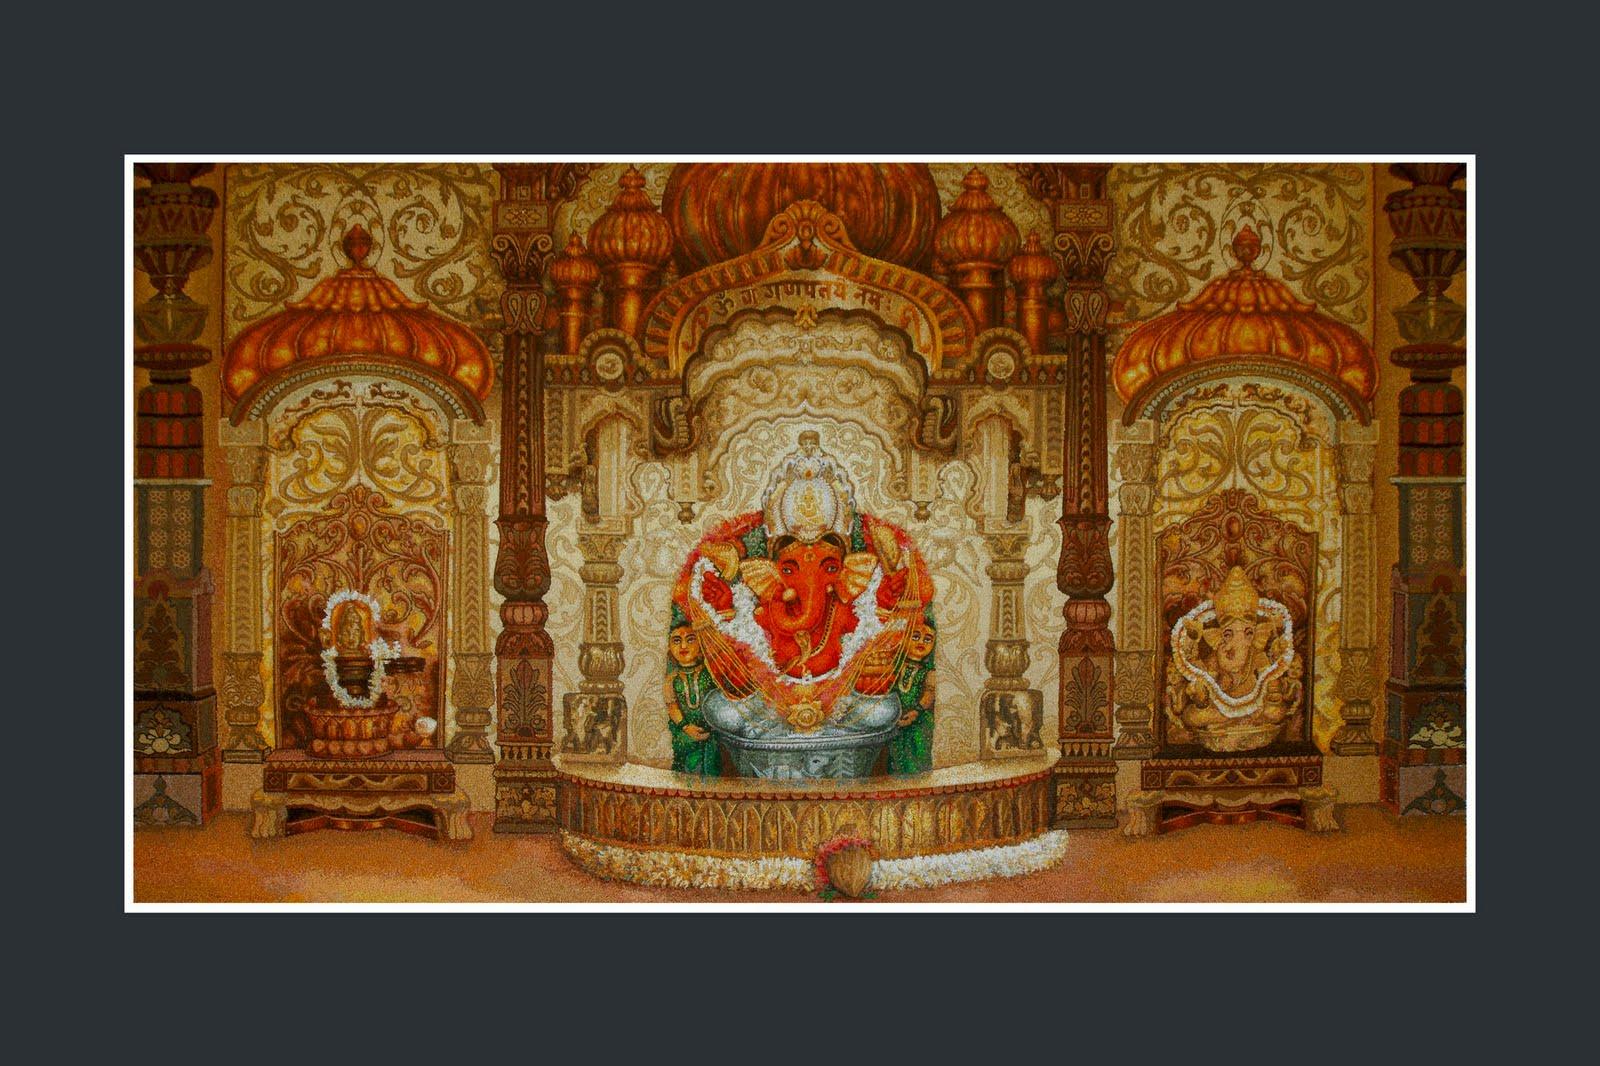 Simple Wallpaper Lord Siddhivinayak - Shri+Siddhivinayak+Completed+Photo  Collection_548517.jpg